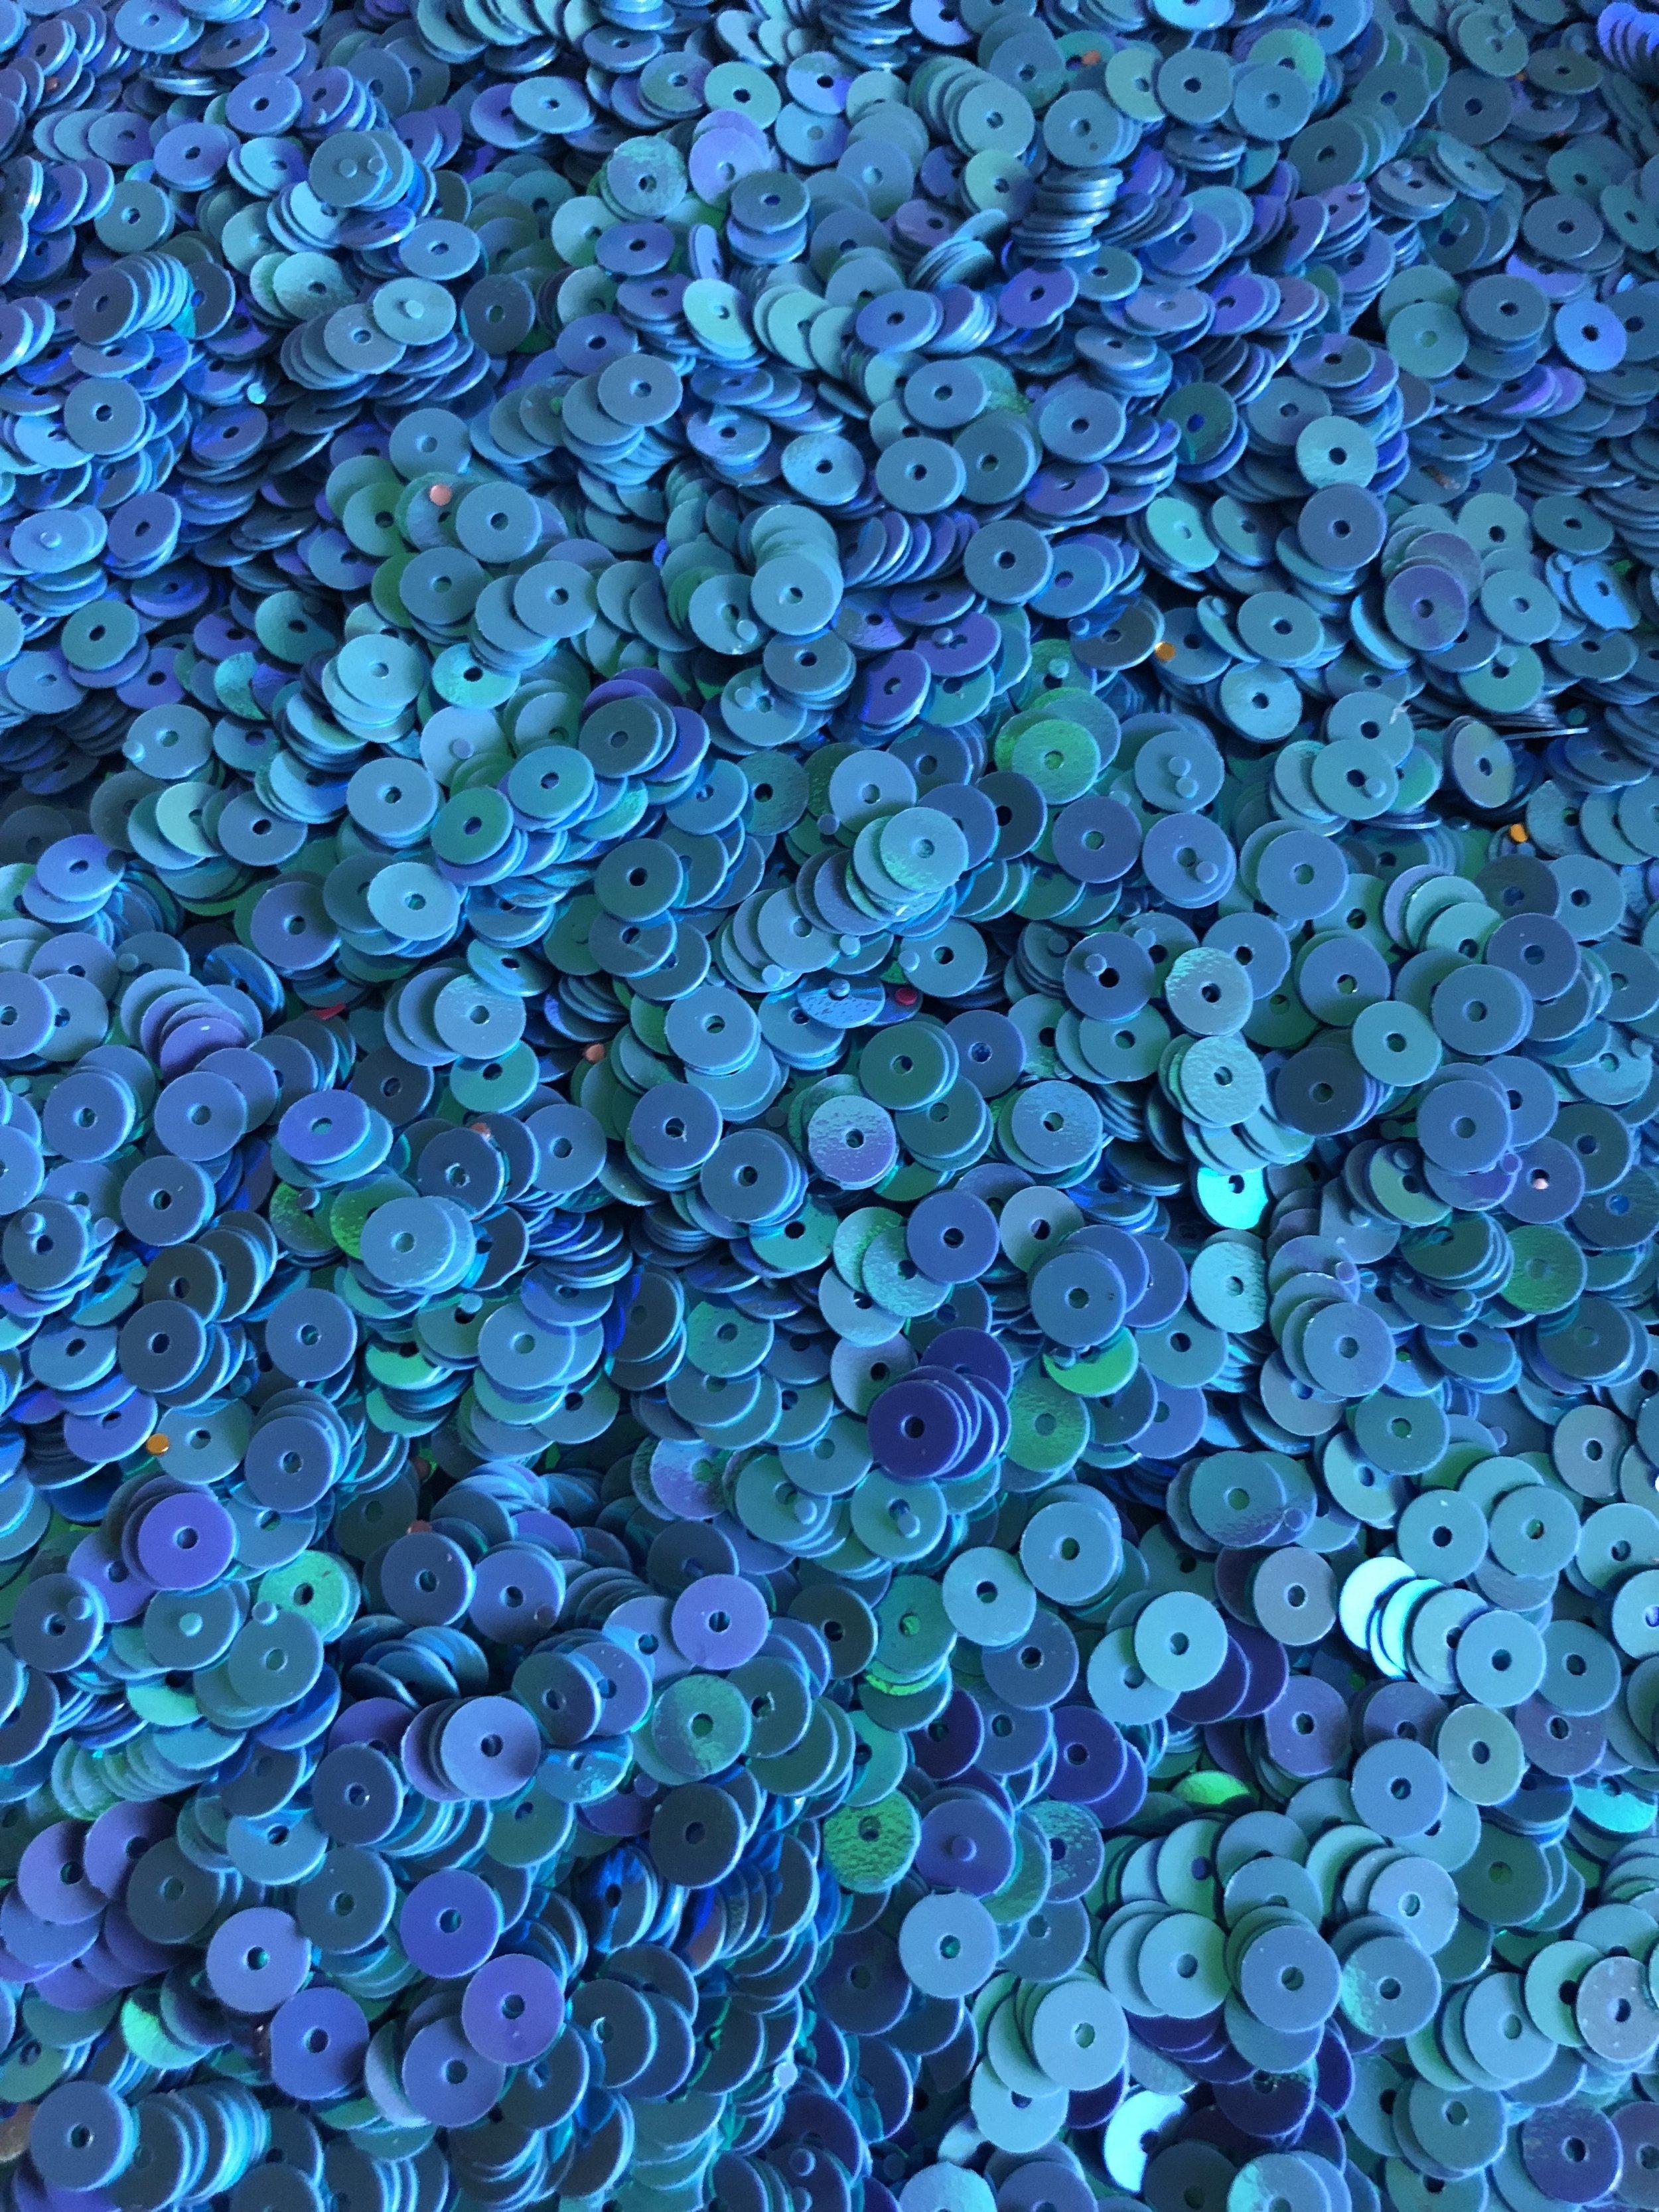 5mm Flat Sequins Iridescent Light Blue/Lavender - Bulk Loose Sequins (1/4 Pound)